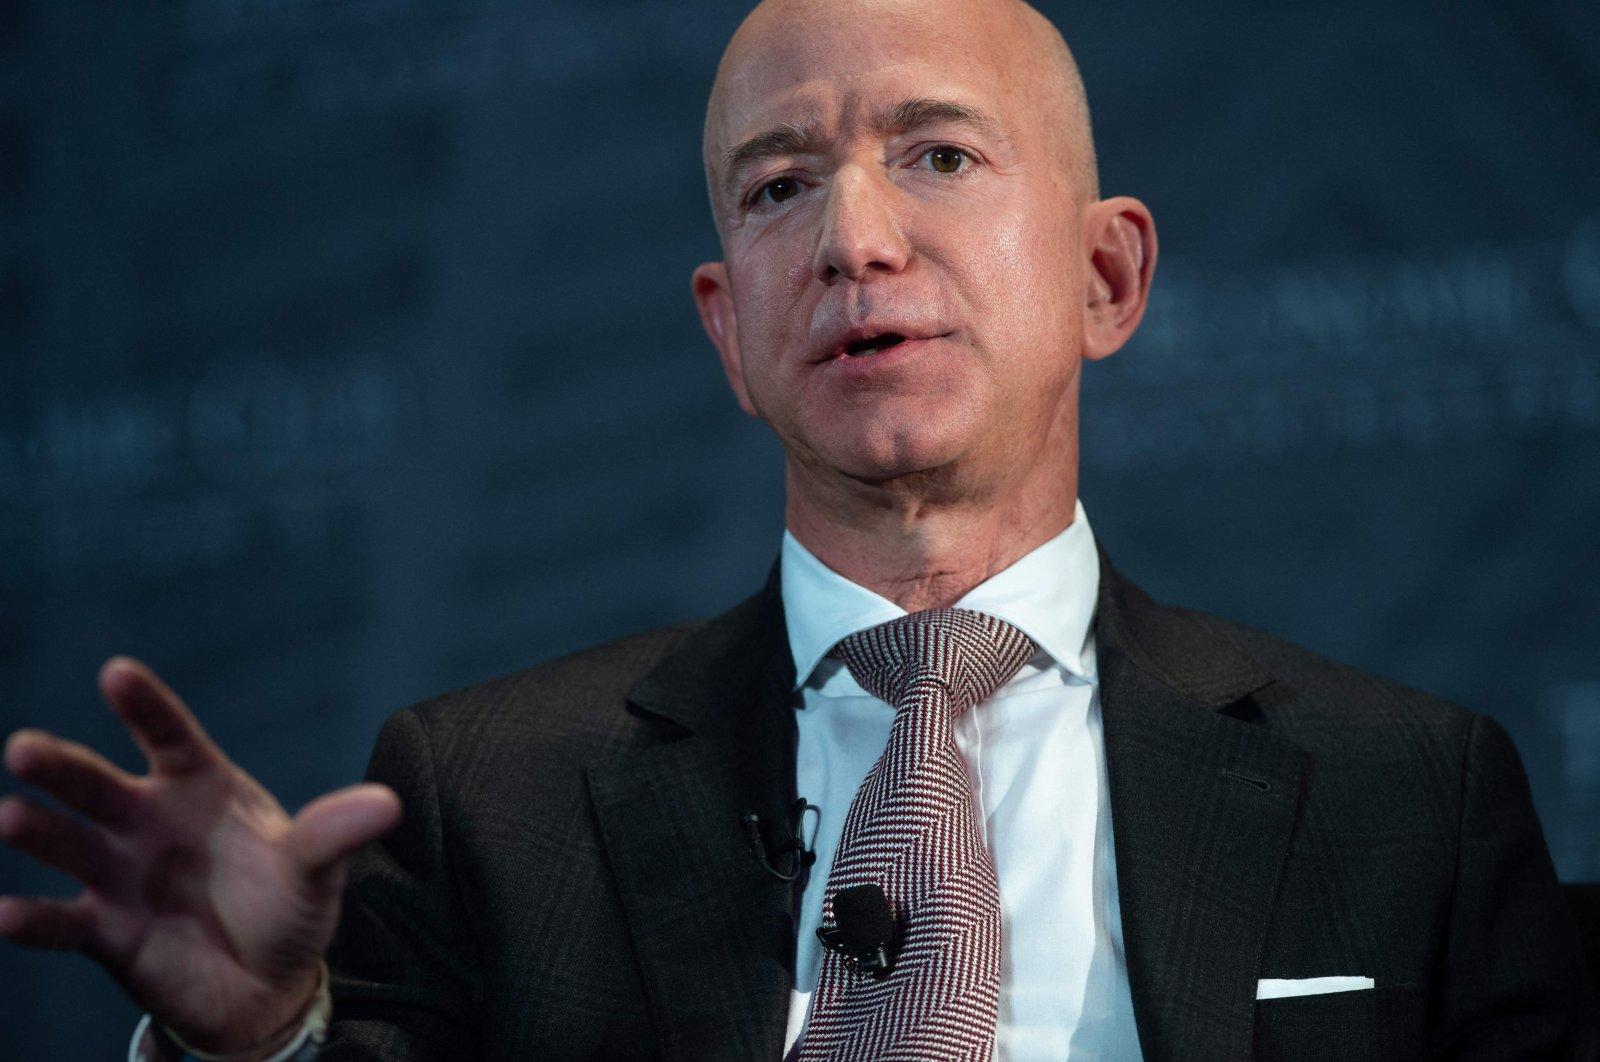 Jeff Bezos, founder and CEO of Amazon, speaks during the Economic Club of Washington's Milestone Celebration event in Washington, D.C., the U.S., Sept. 13, 2018. (AFP Photo)